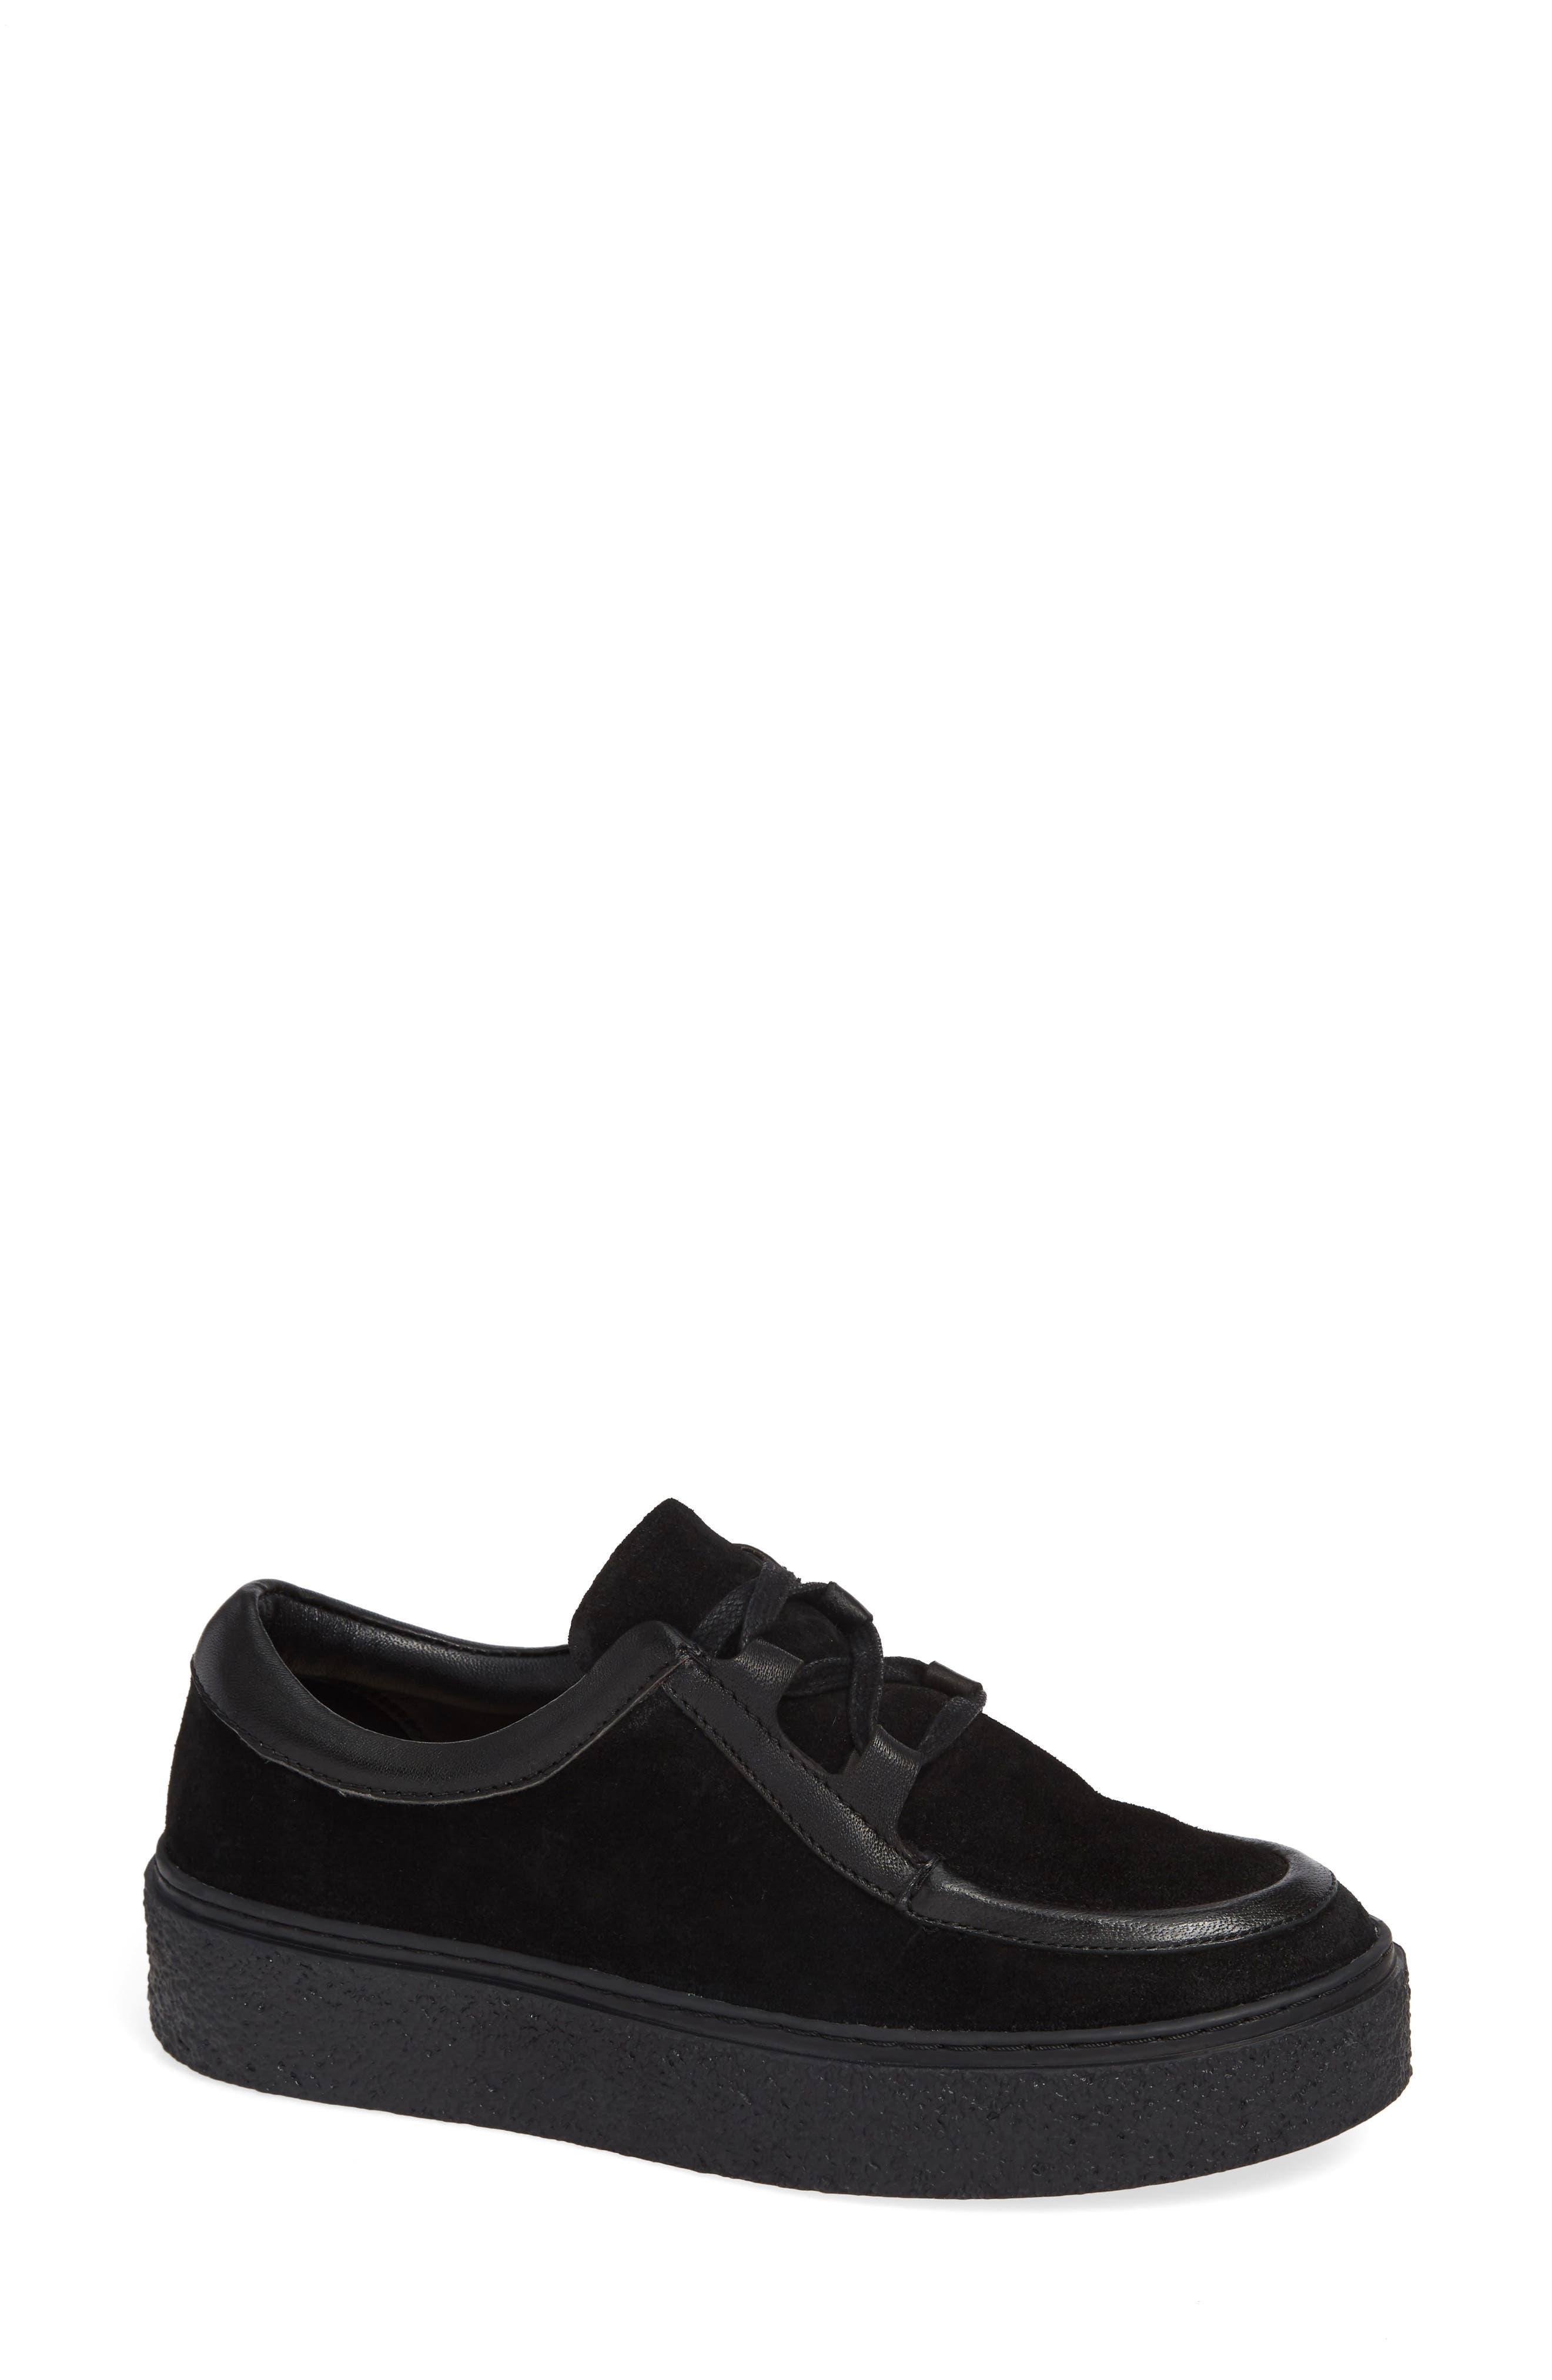 Seychelles Cultivate Sneaker- Black